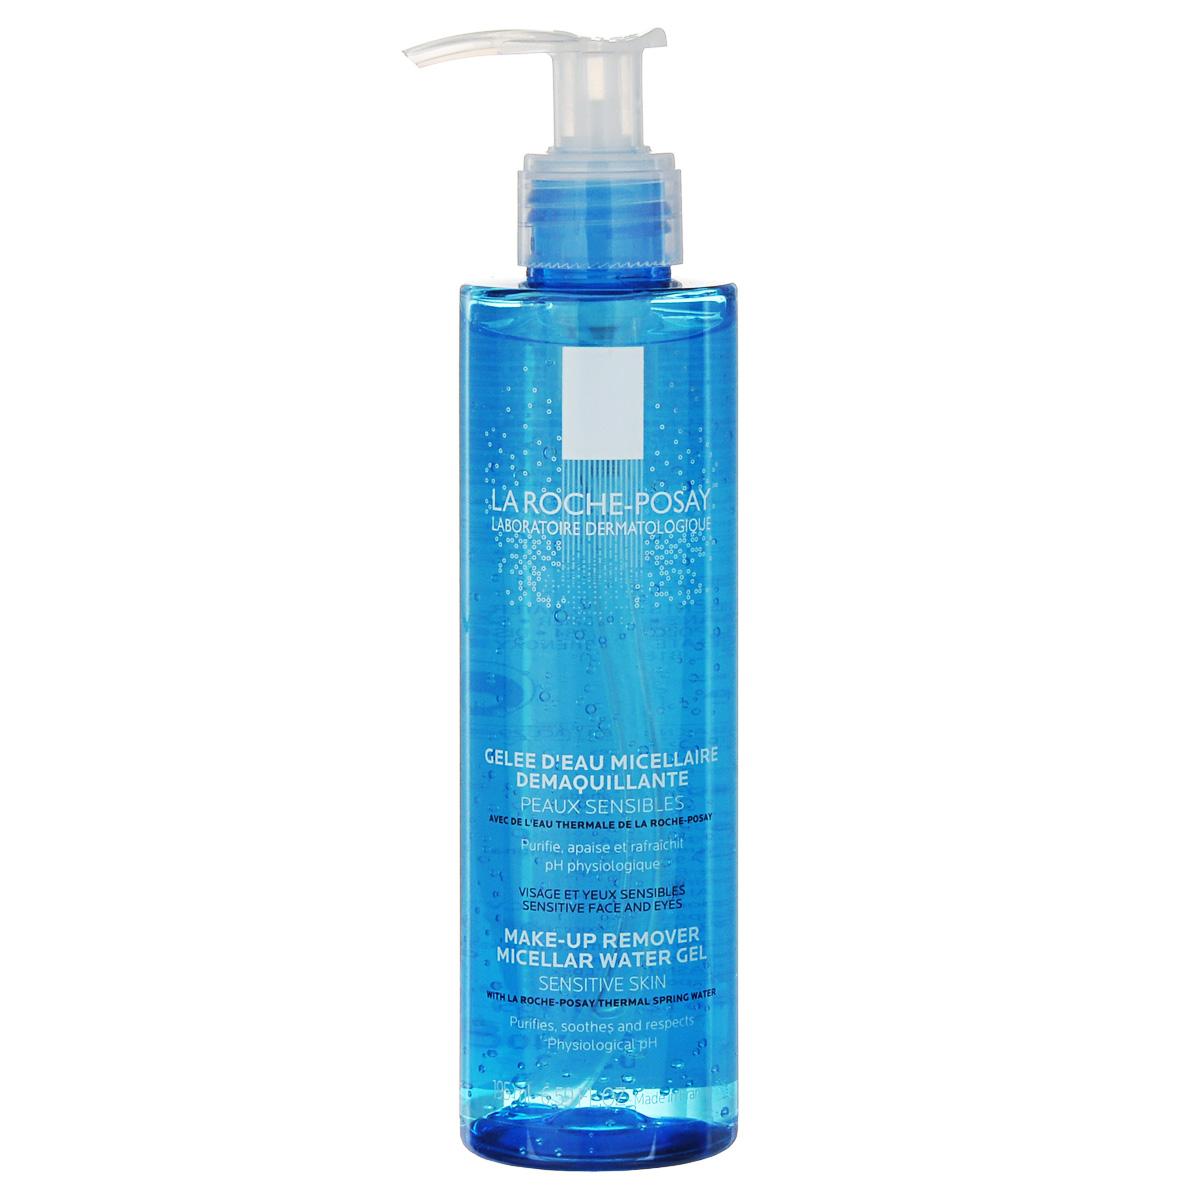 La Roche-Posay Гель мицеллярный очищающий для чувствительной кожи лица Physiological Cleansers 195 мл гель la roche posay effaclar duo[ ] unifiant